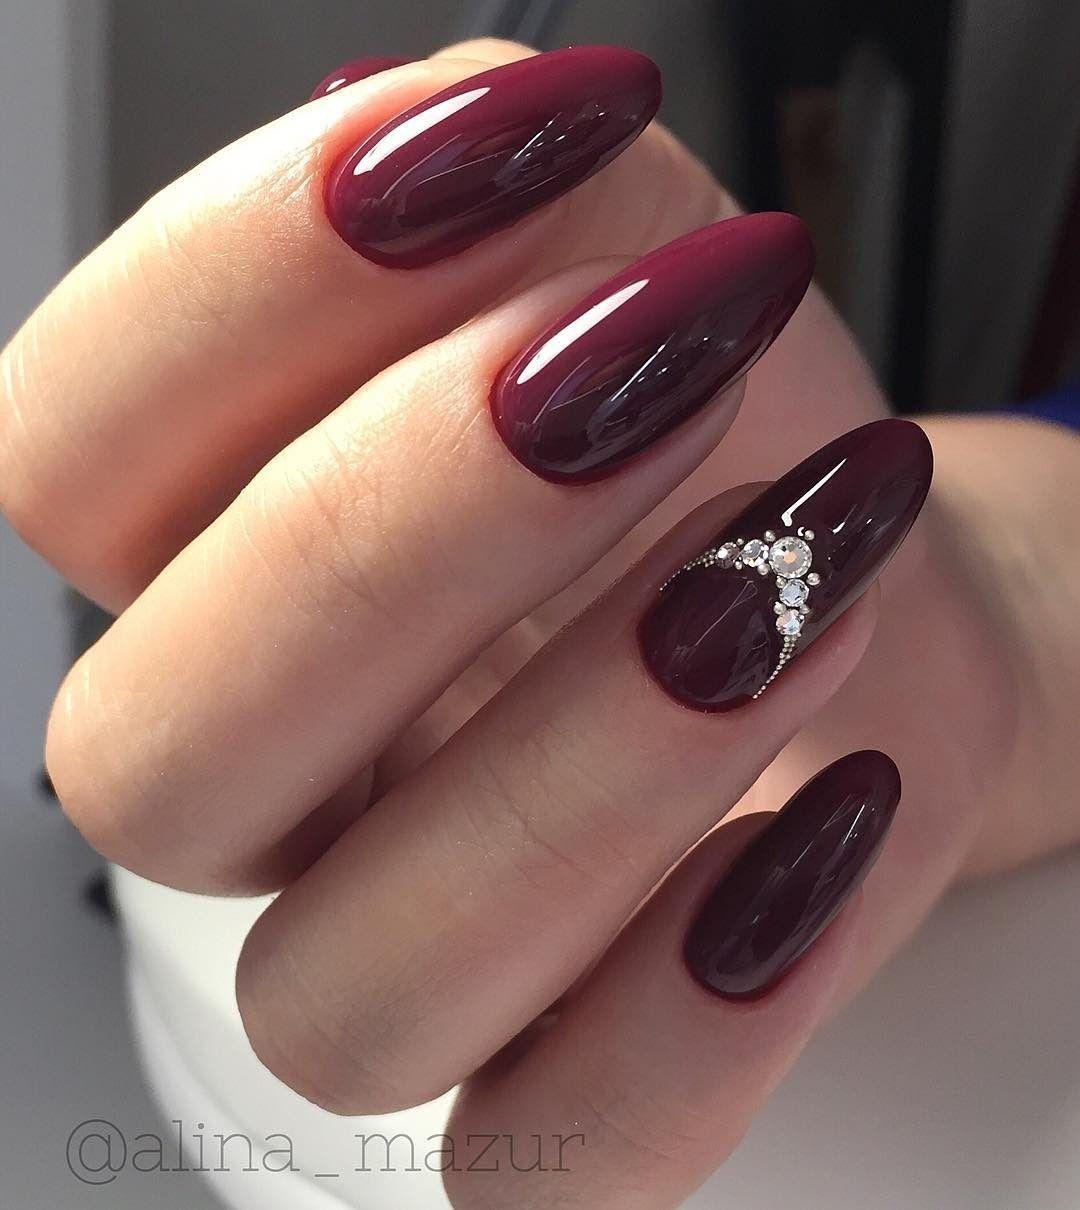 Pin By Natalakrivko On Dizajn Krasnyj Burgundy Nails Red Acrylic Nails Wine Nails